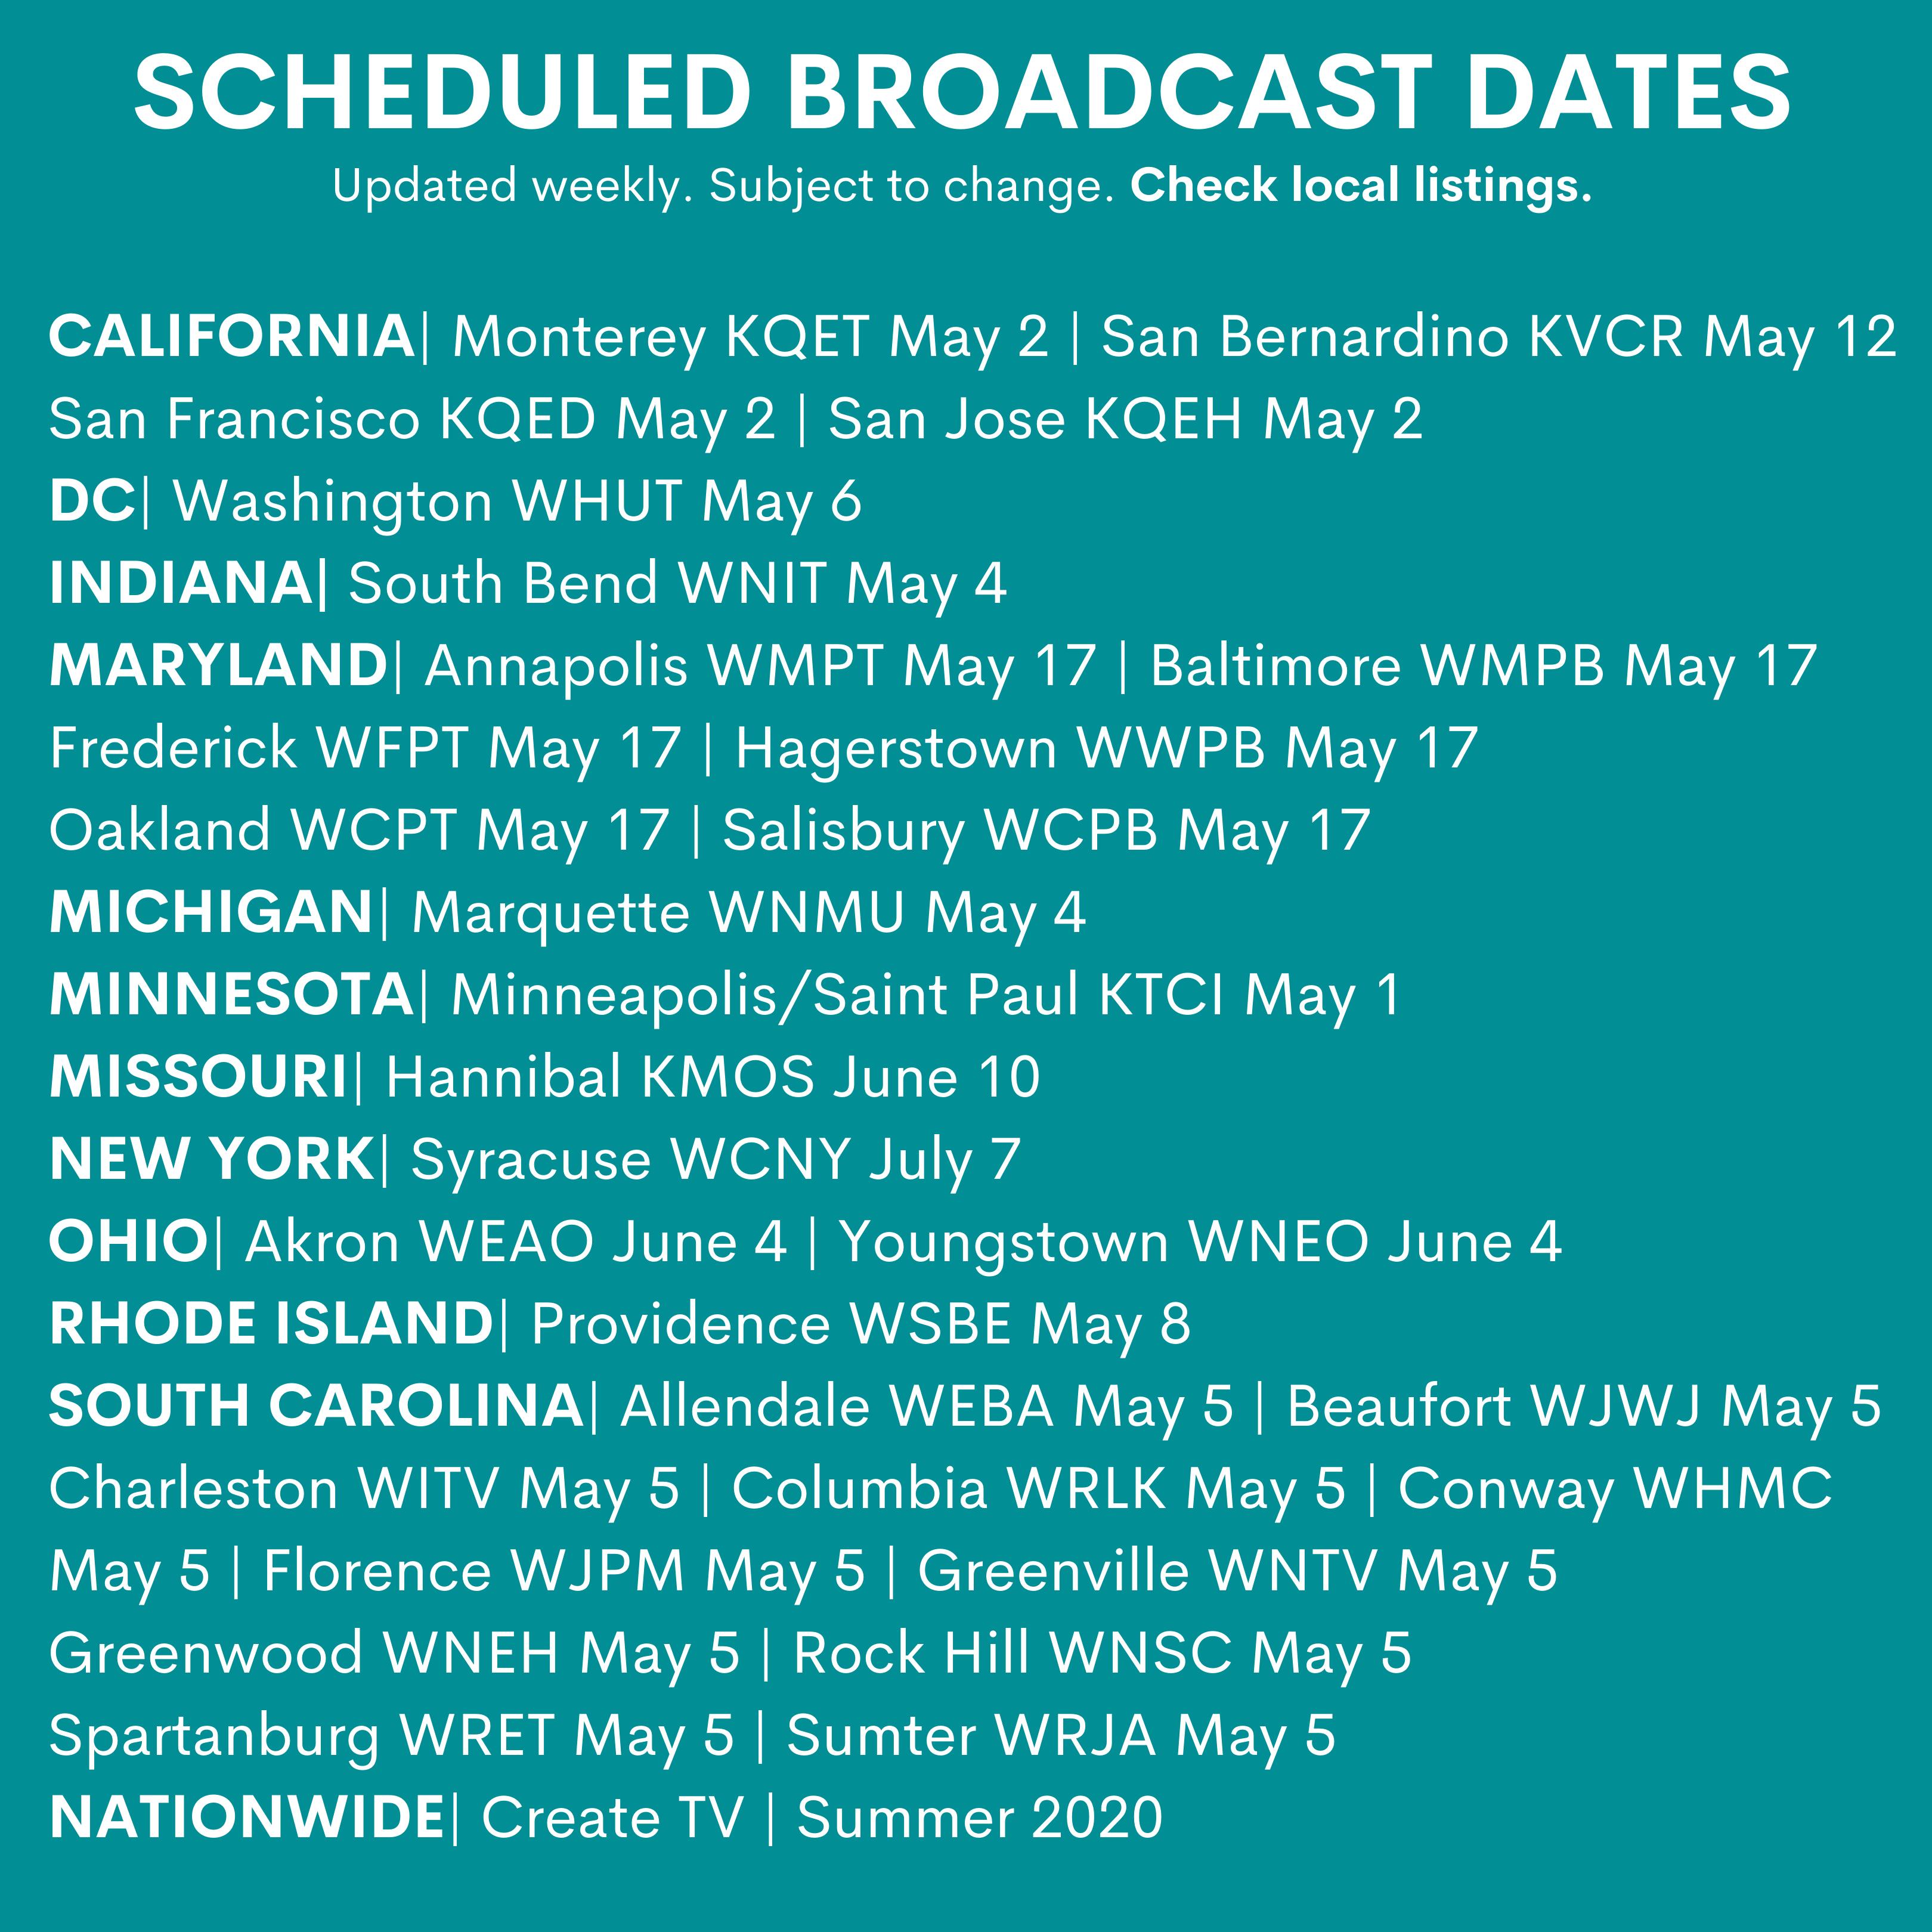 Broadcast Dates